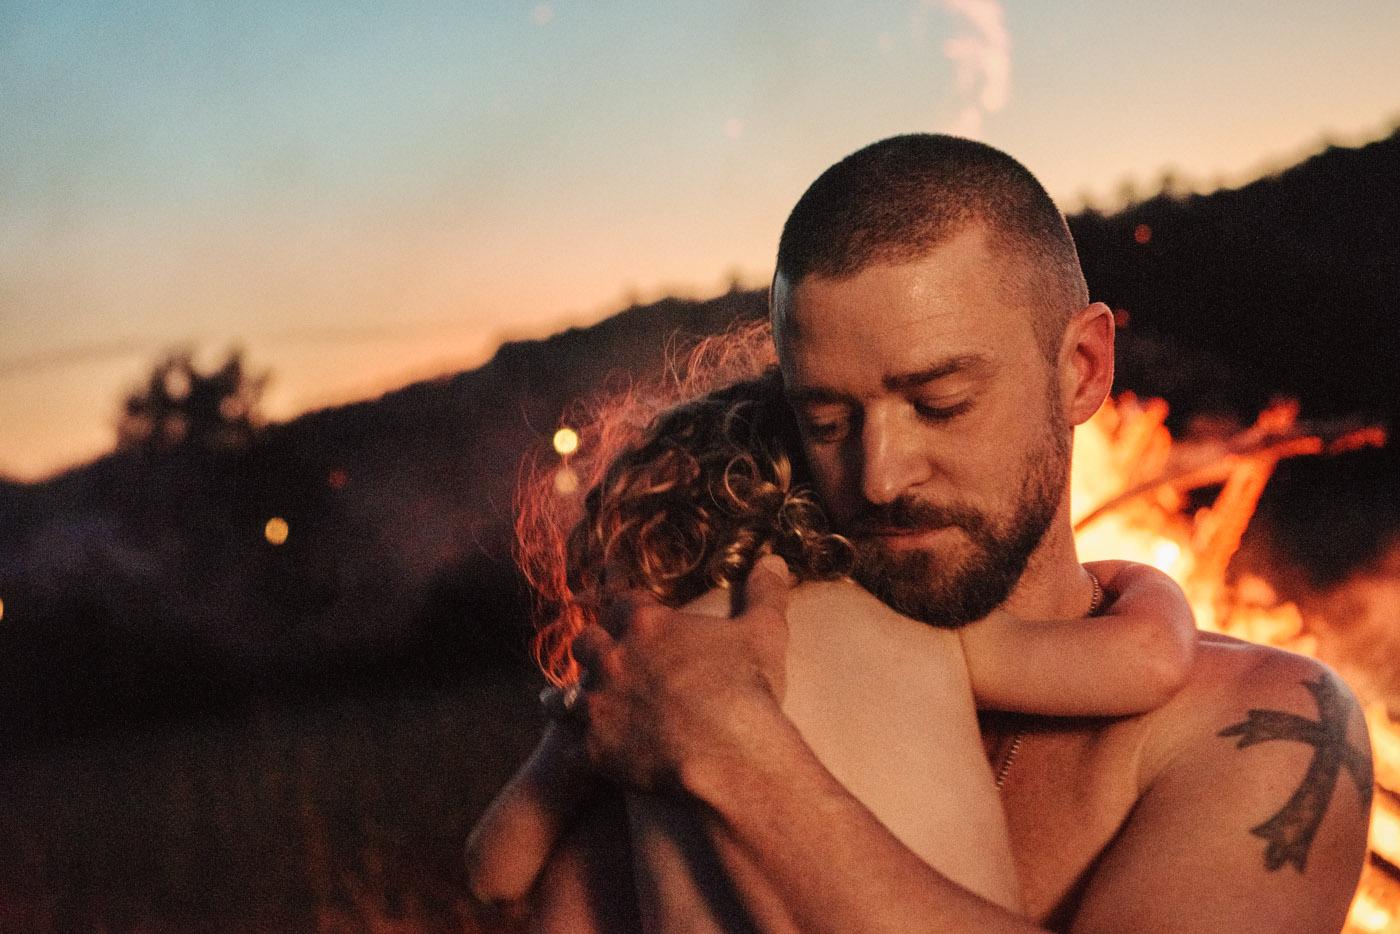 Justin Timberlake, Man of the Woods Album, February 2, 2018.